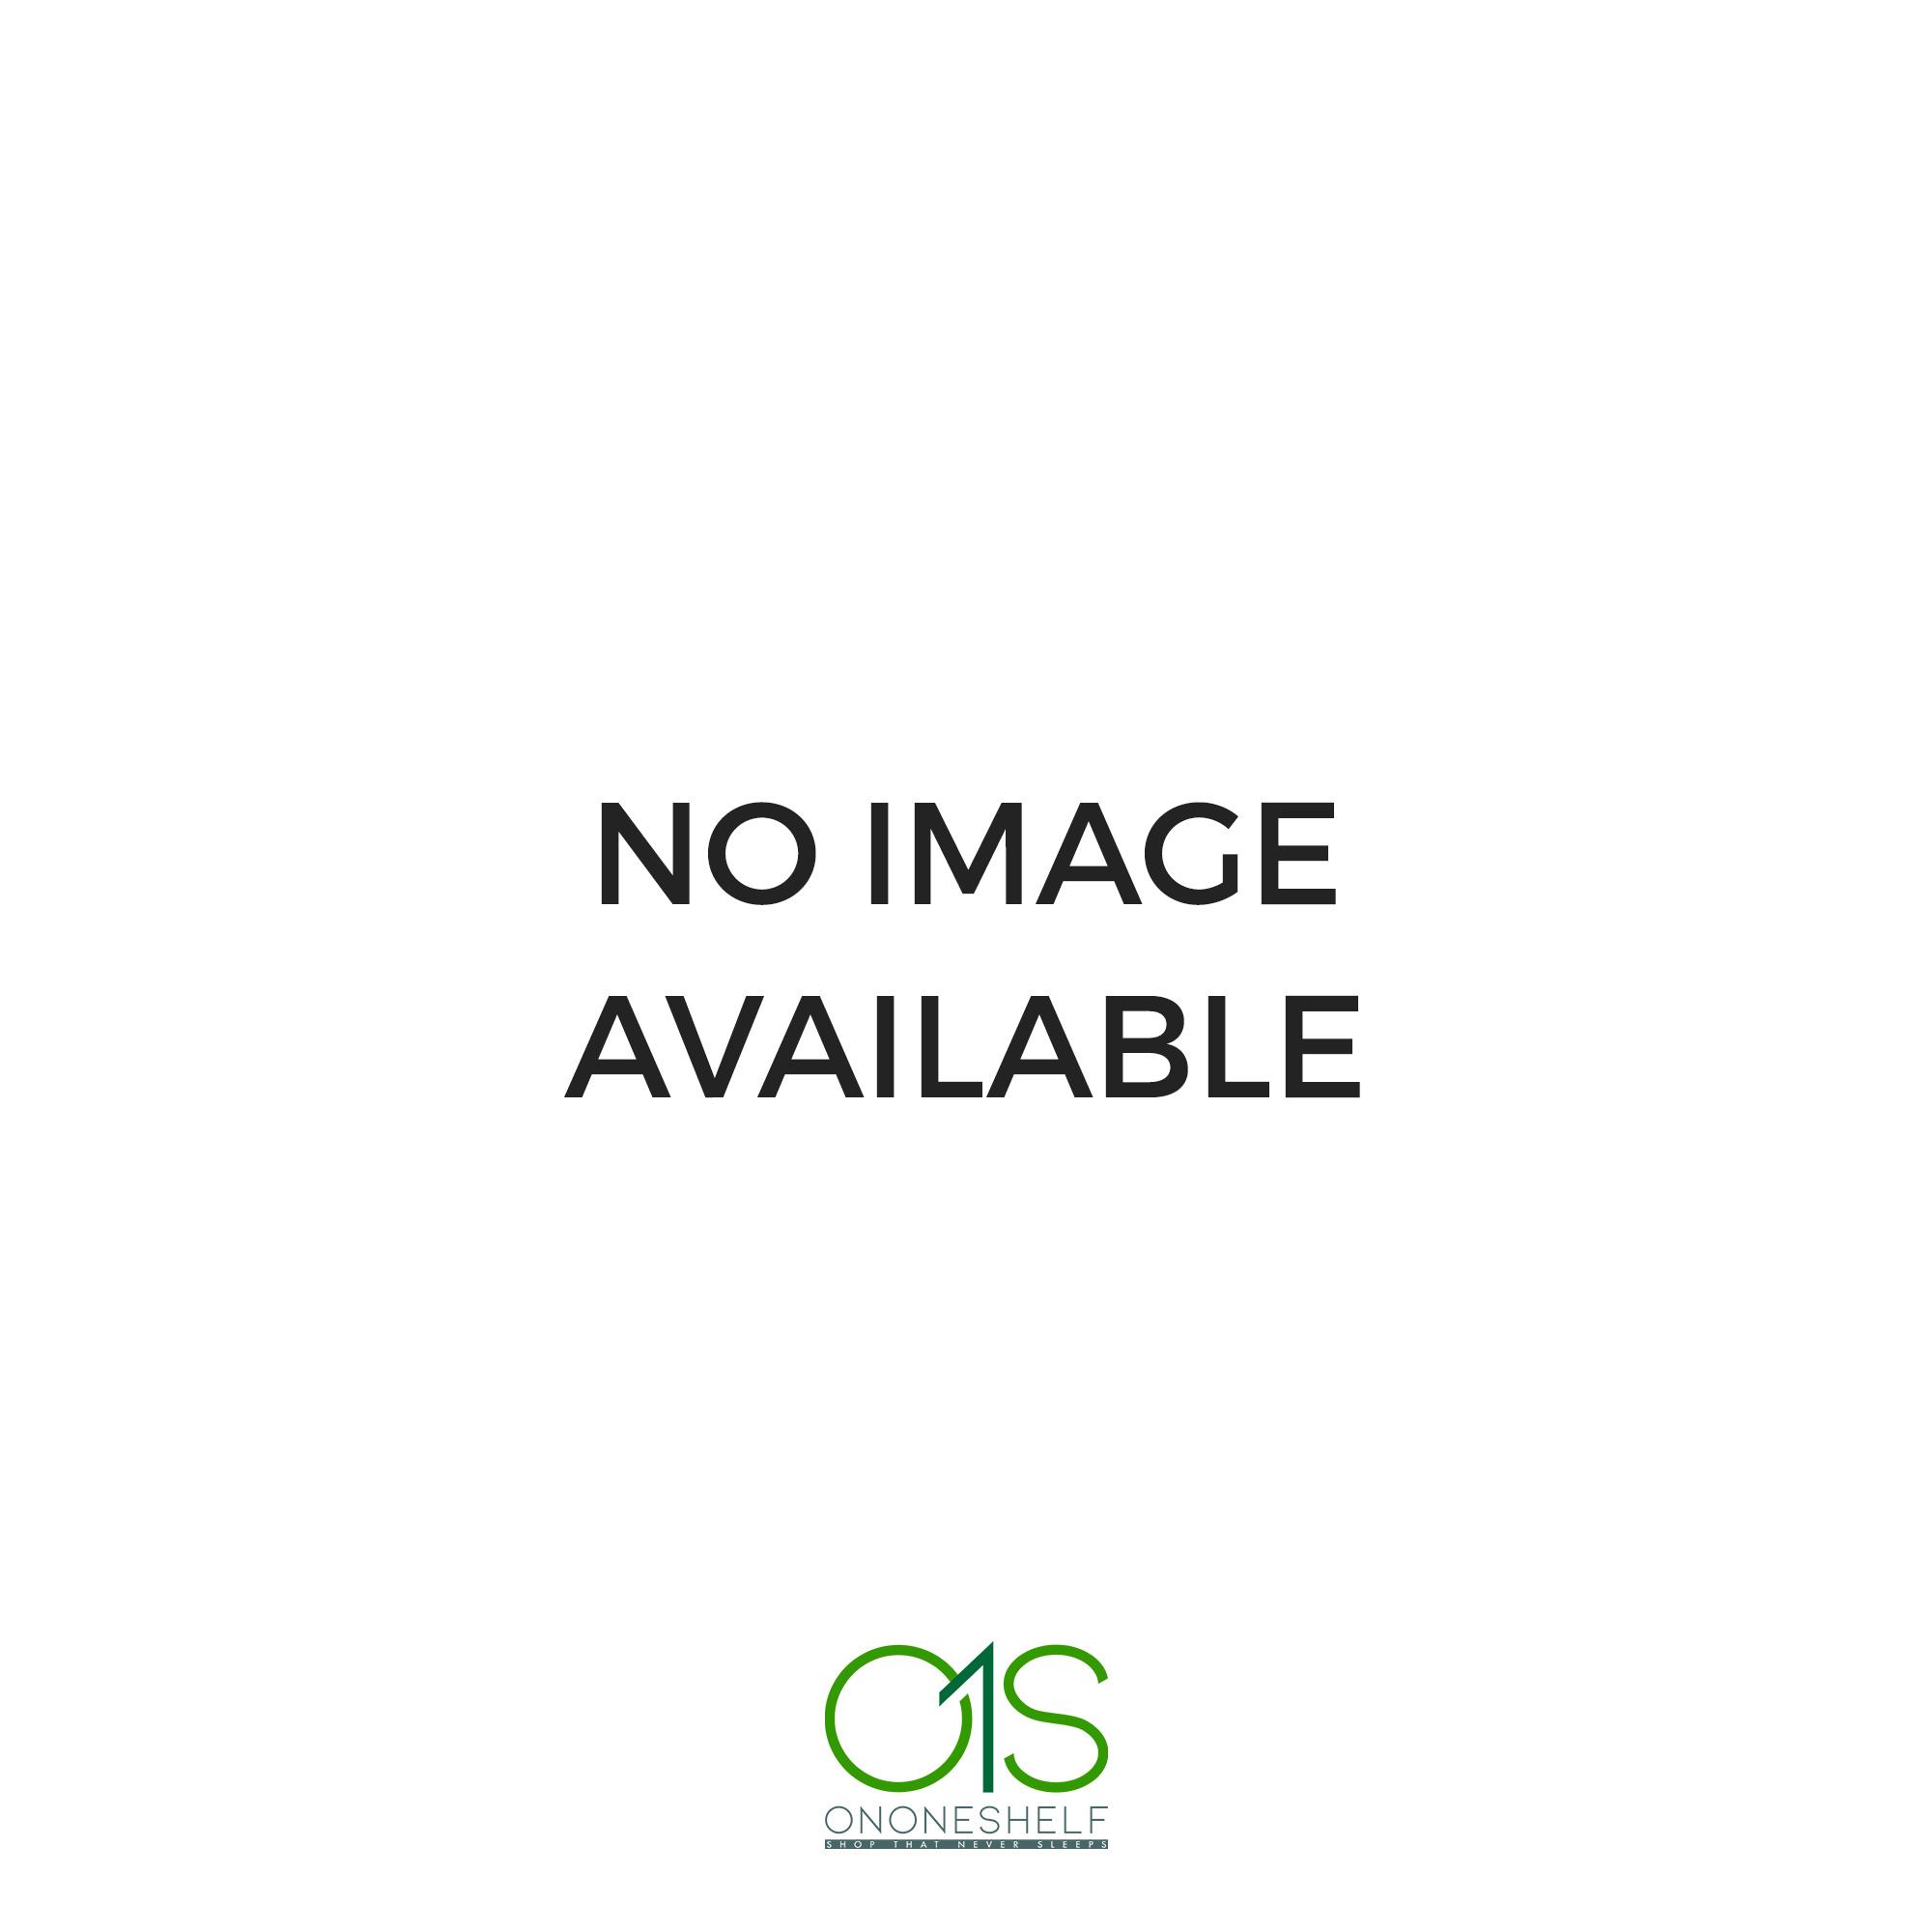 Polycarbonate Sheets & Acc